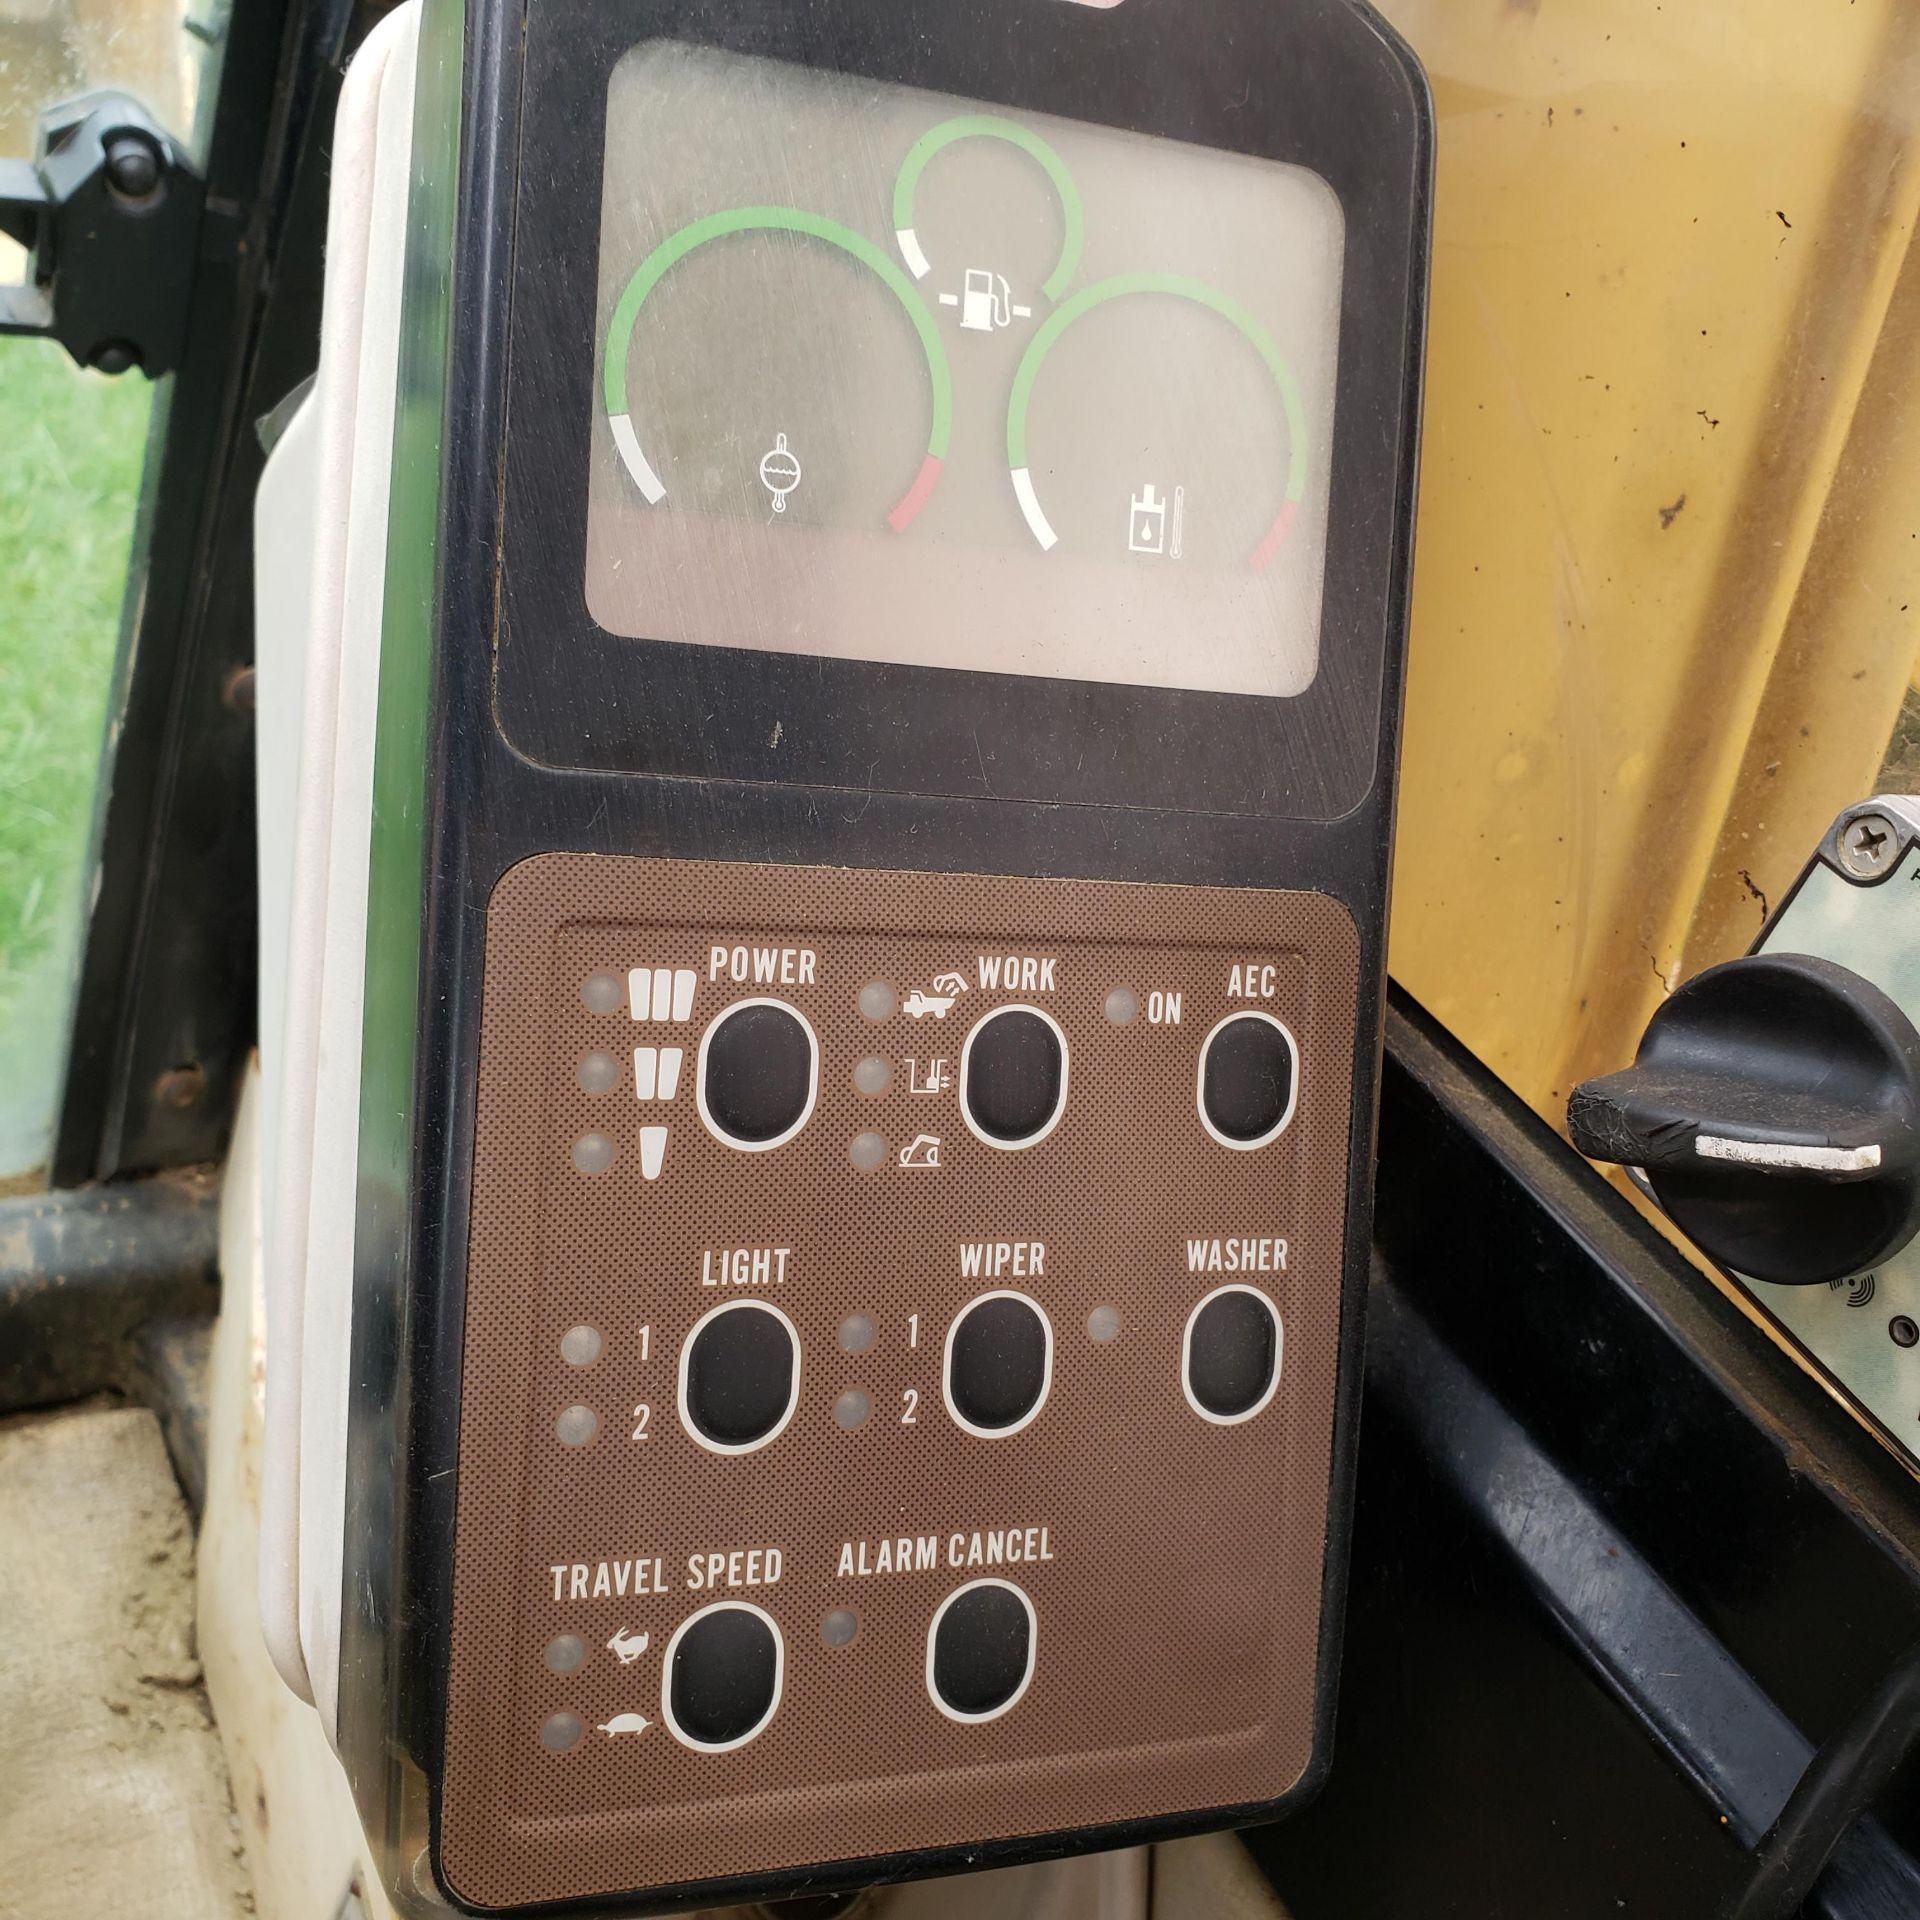 1996 Caterpillar 322L Hydraulic Excavator, Enclosed Cab, 28 in Bucket, Cat 3116 Engine, 9579 Hours - Image 14 of 18